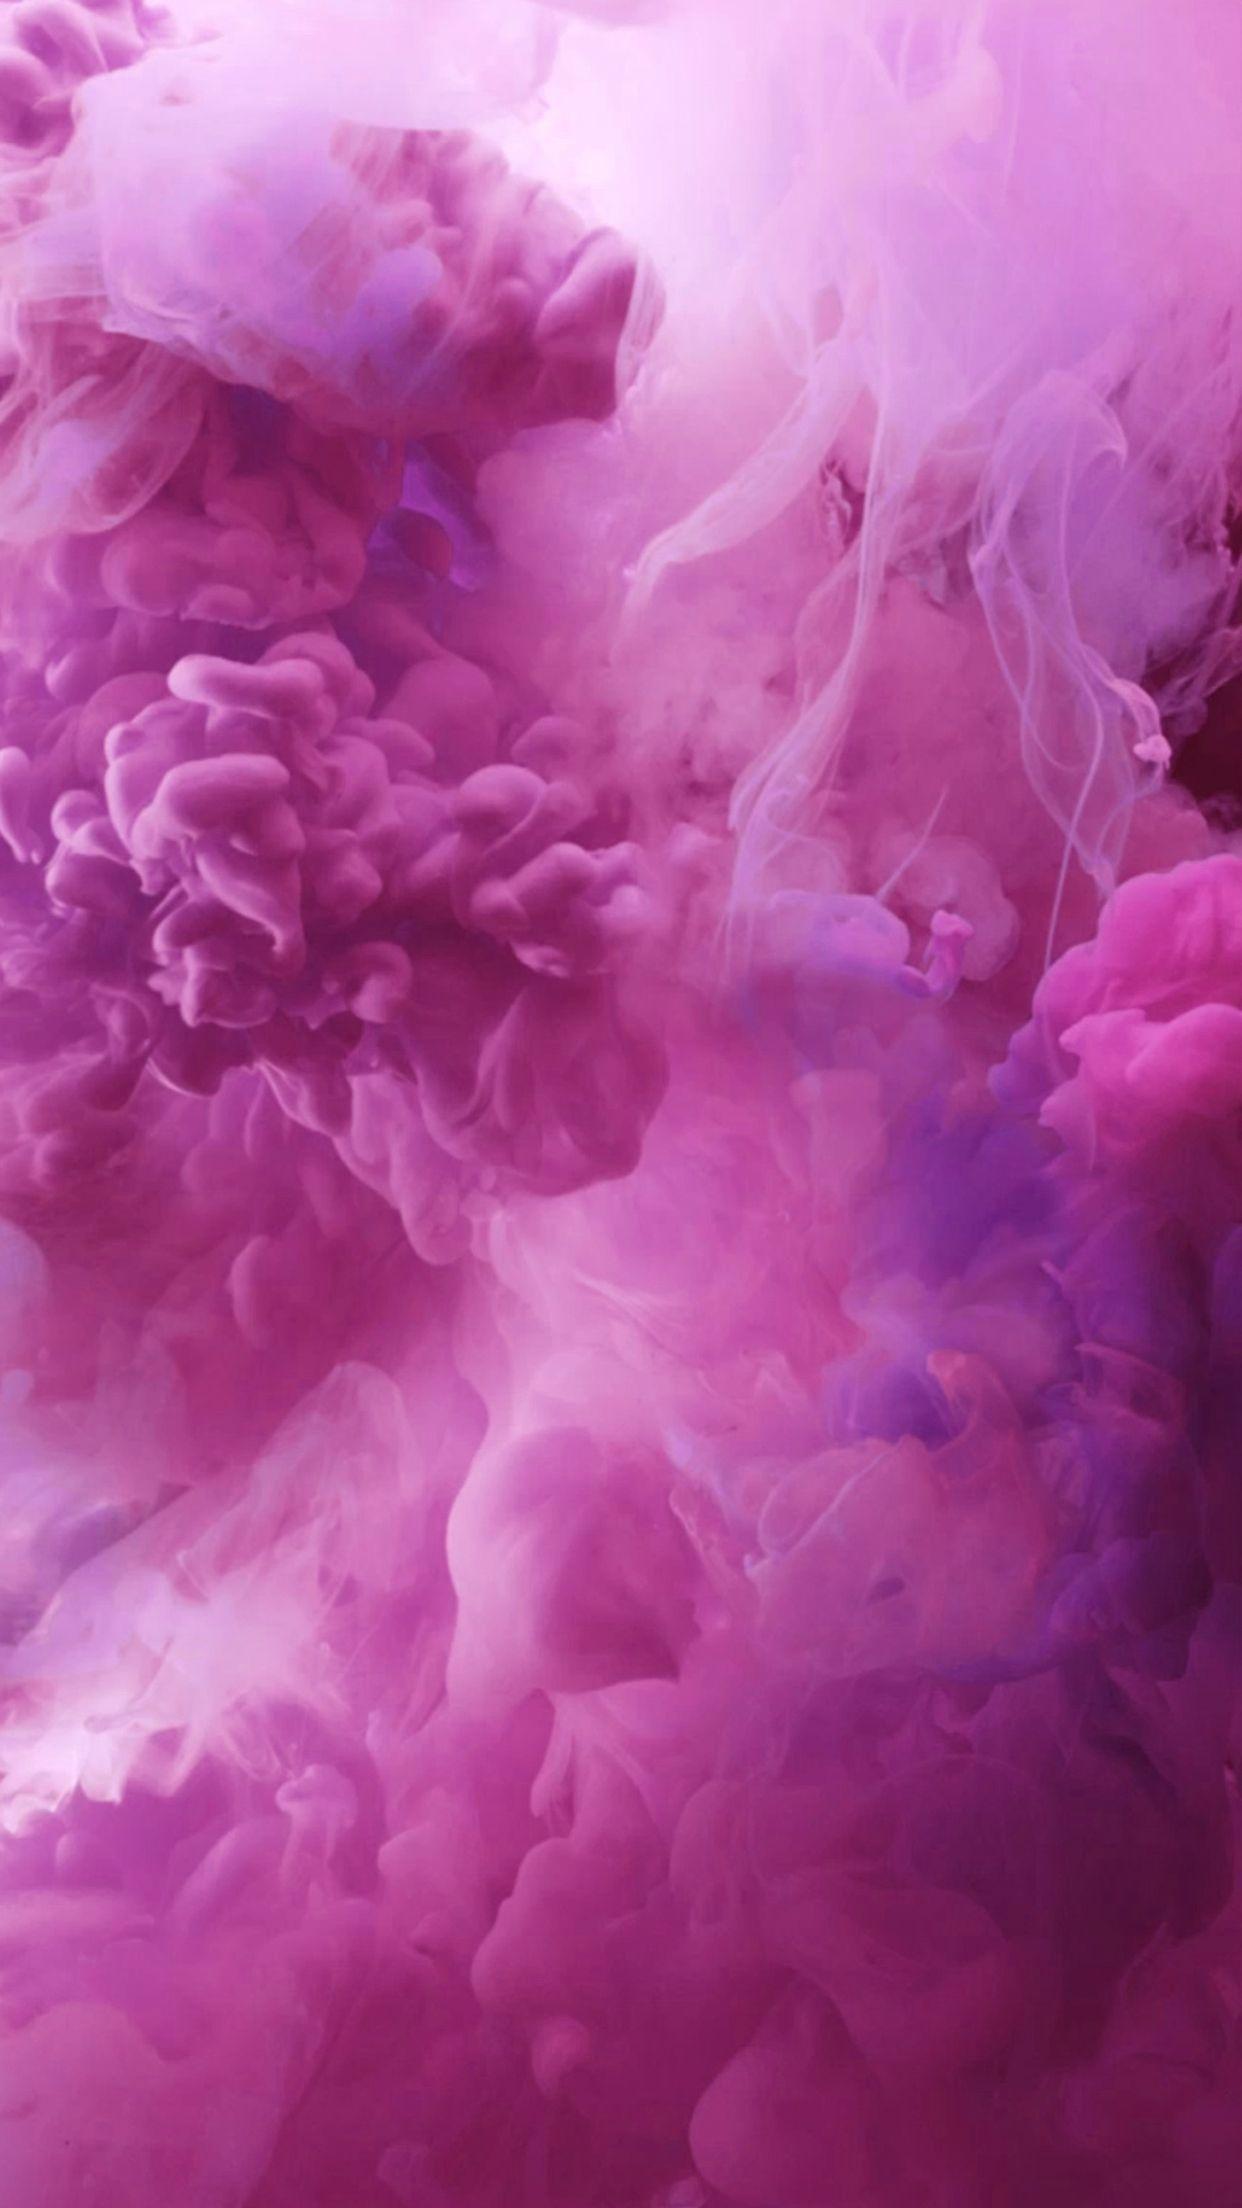 Sensational Smoke Wallpapers Top Free Smoke Backgrounds Wallpaperaccess Download Free Architecture Designs Barepgrimeyleaguecom